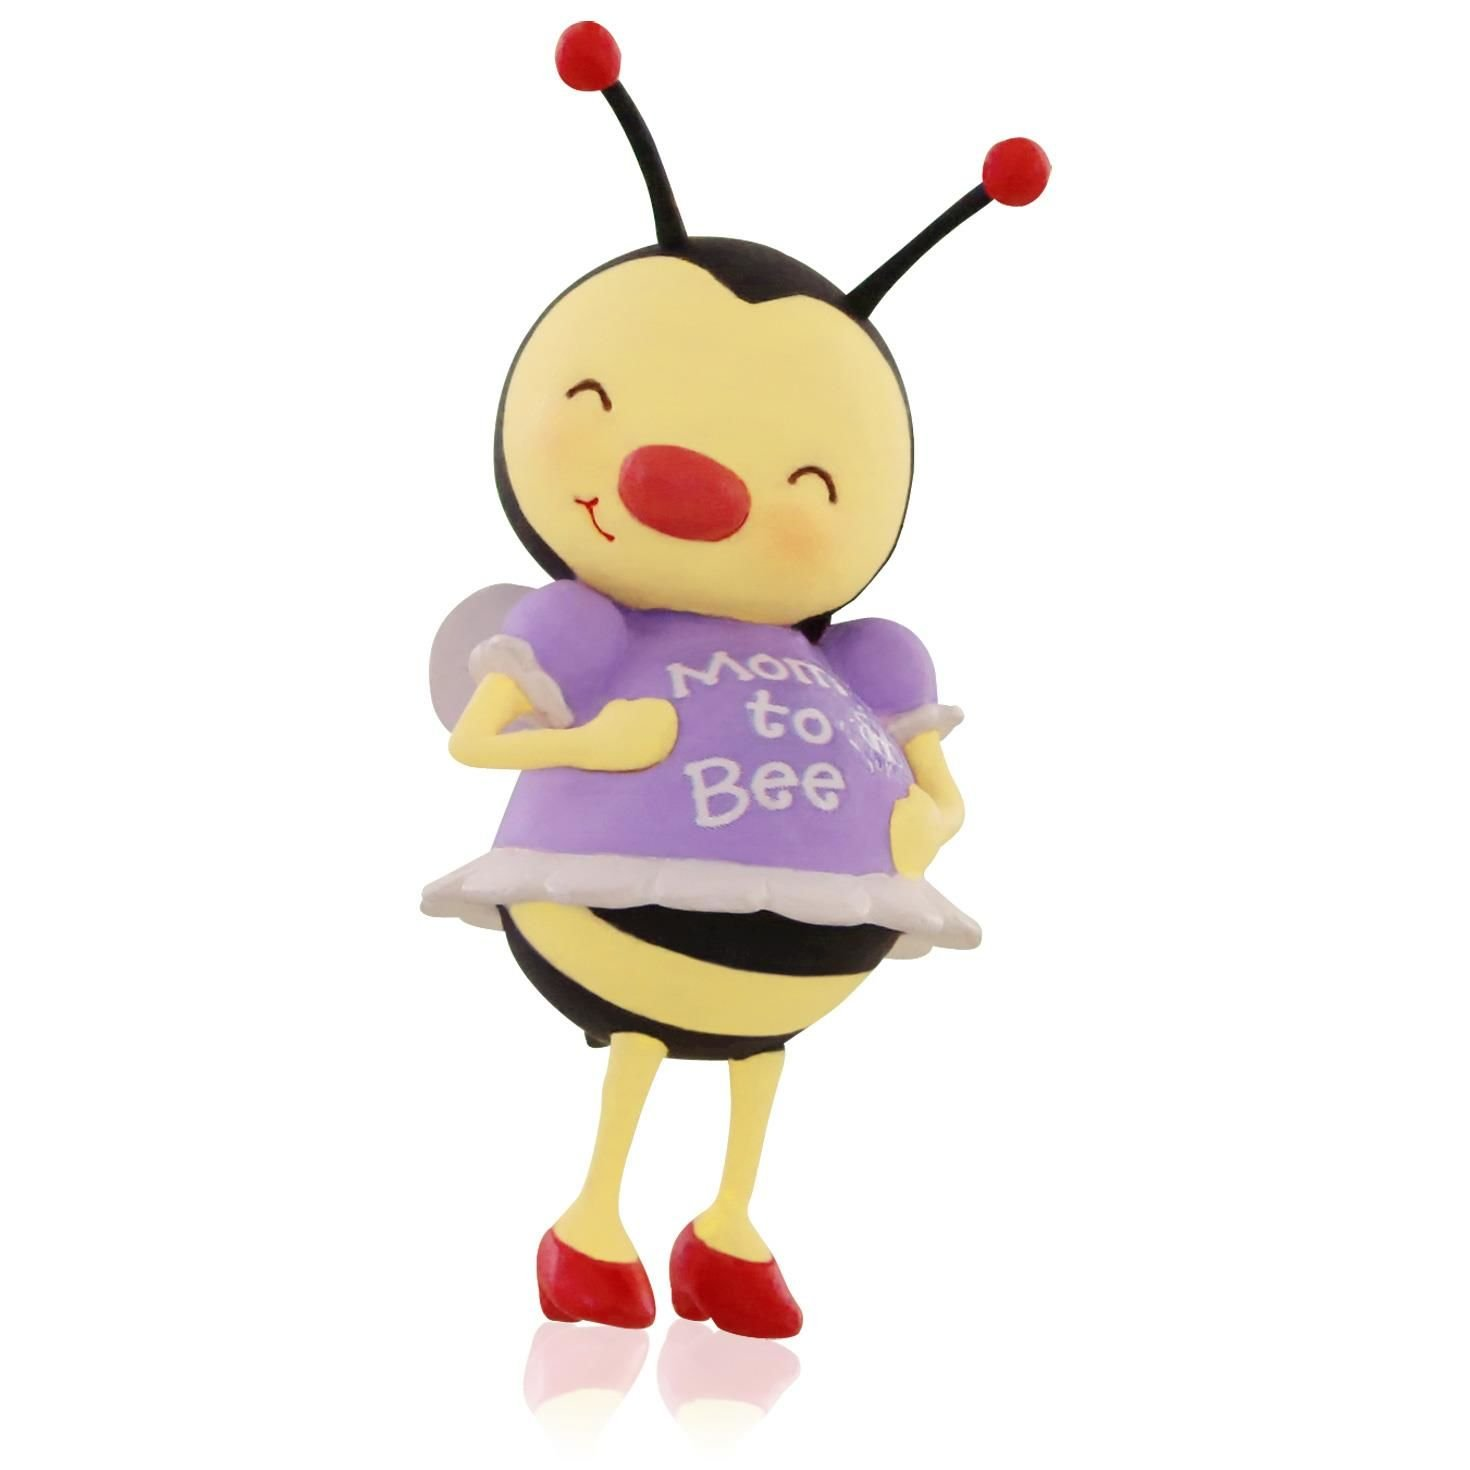 Amazon: Hallmark Qgo1127 Mom To Bee Pregnancy Ornament: Home & Kitchen